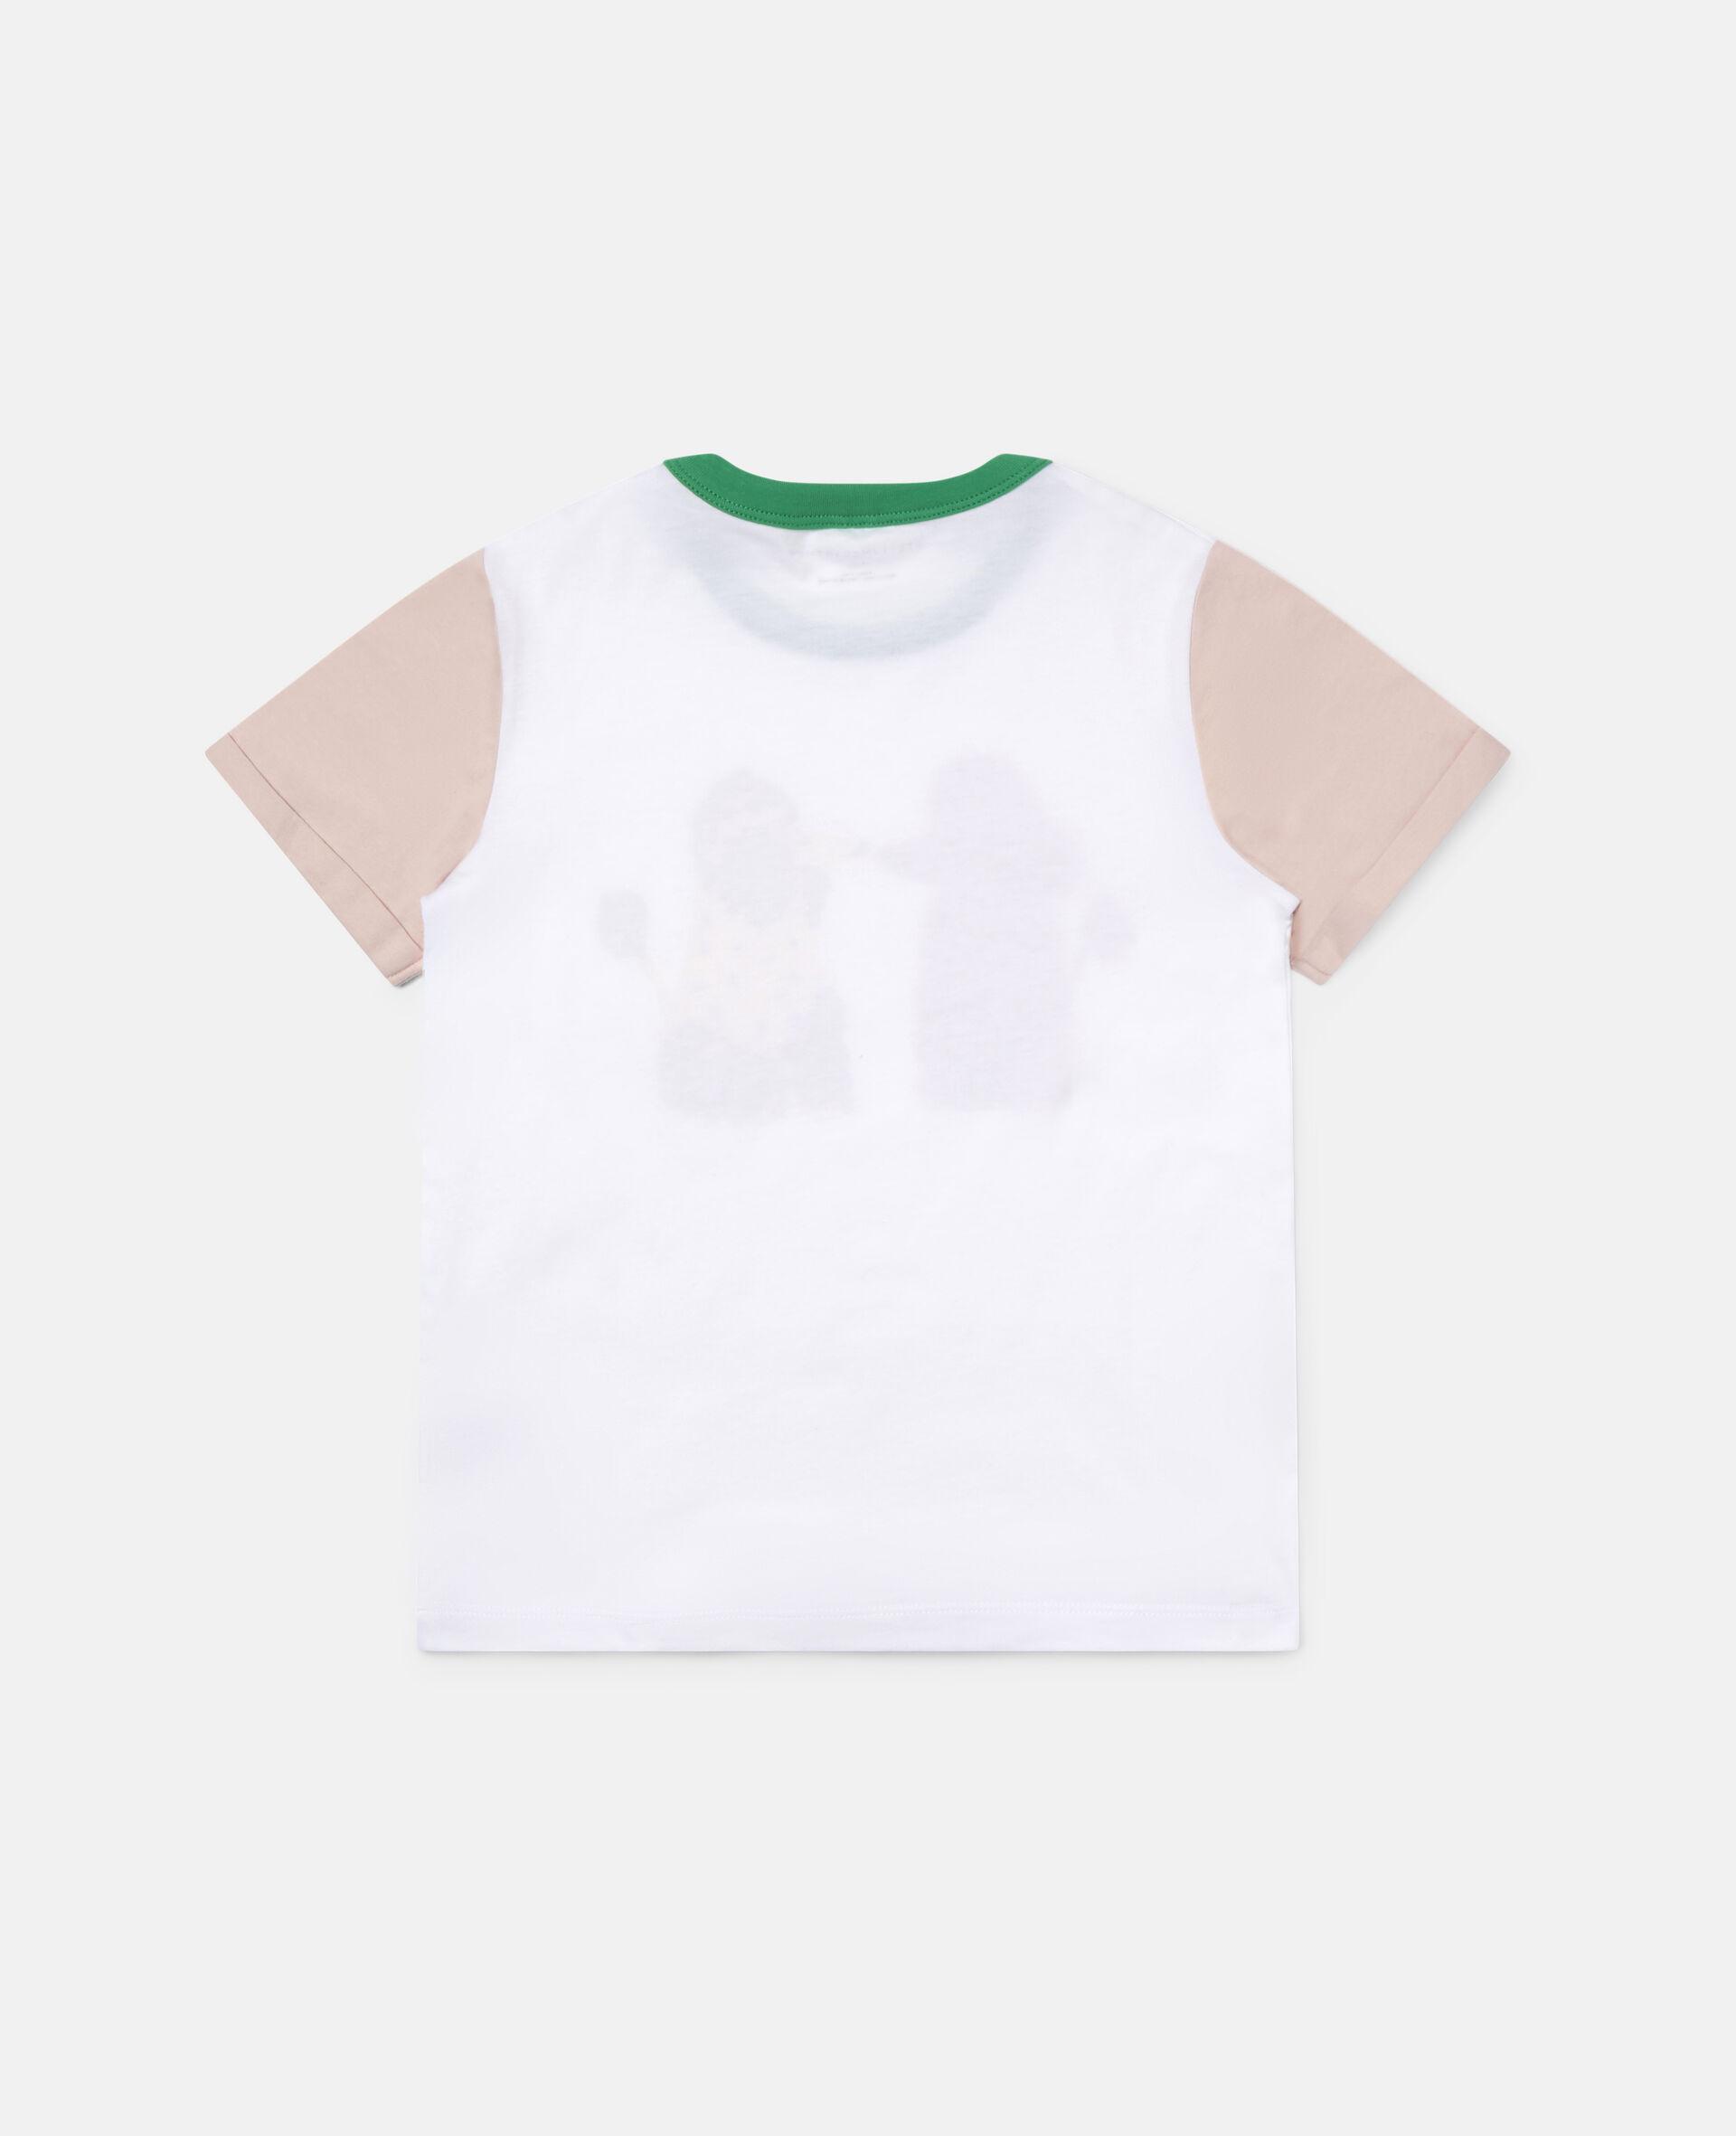 T-Shirt aus Baumwolle mit Pudelpaar-Weiß-large image number 3